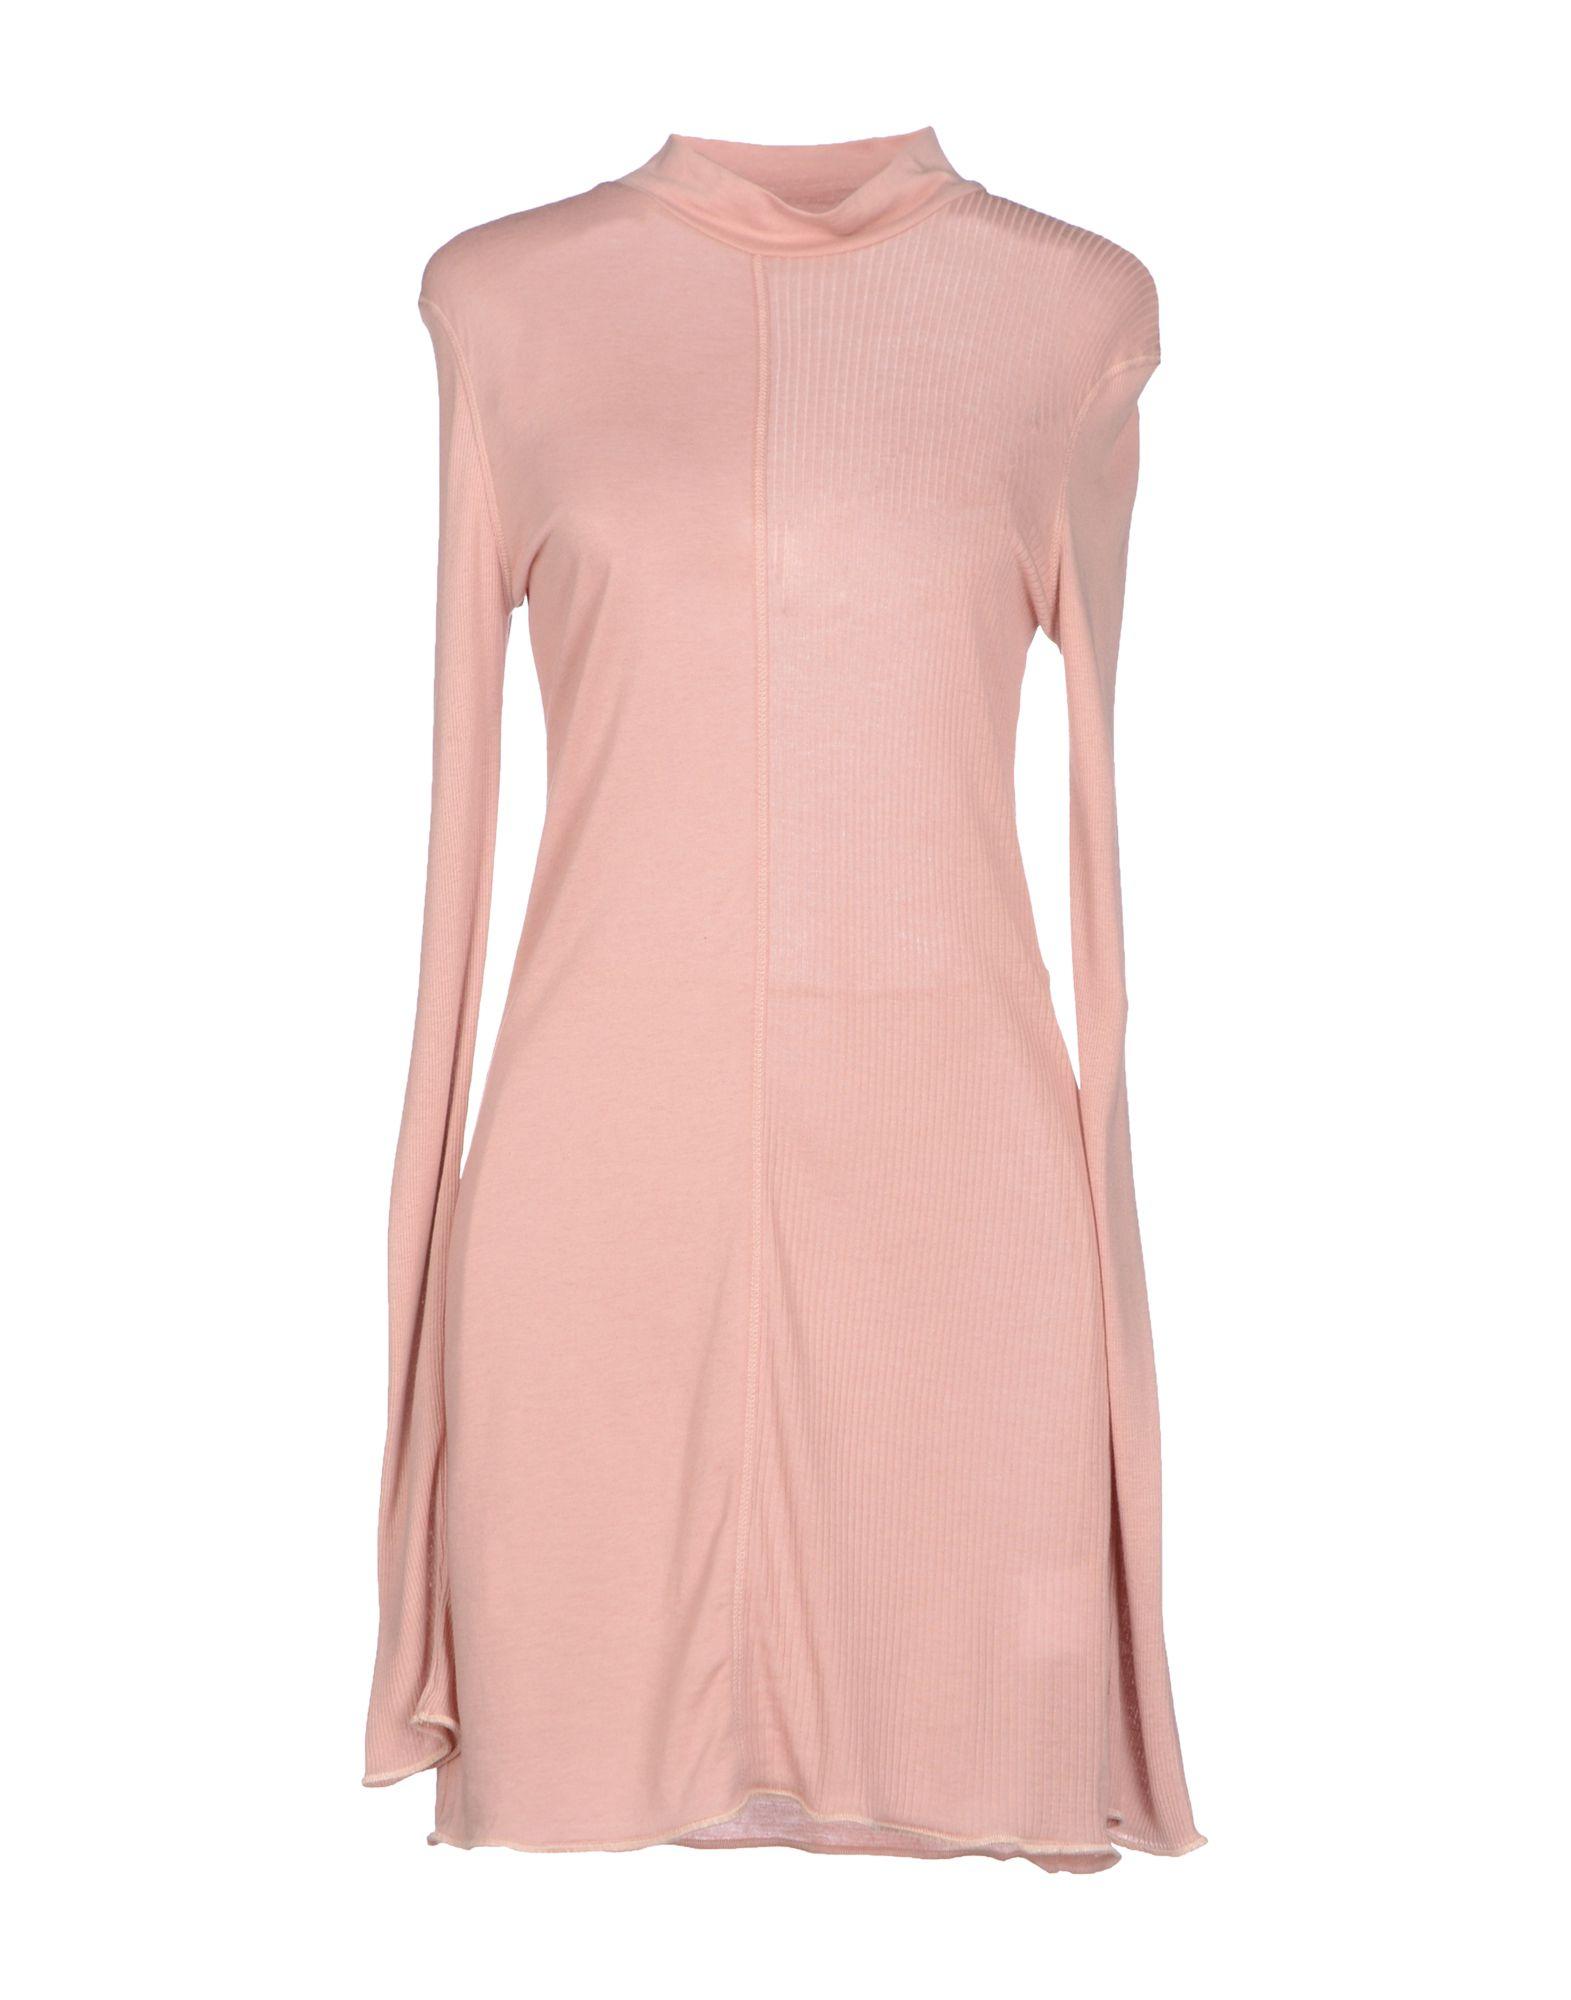 Acne Studios Roll Neck Sweater Dress In Pink Lyst